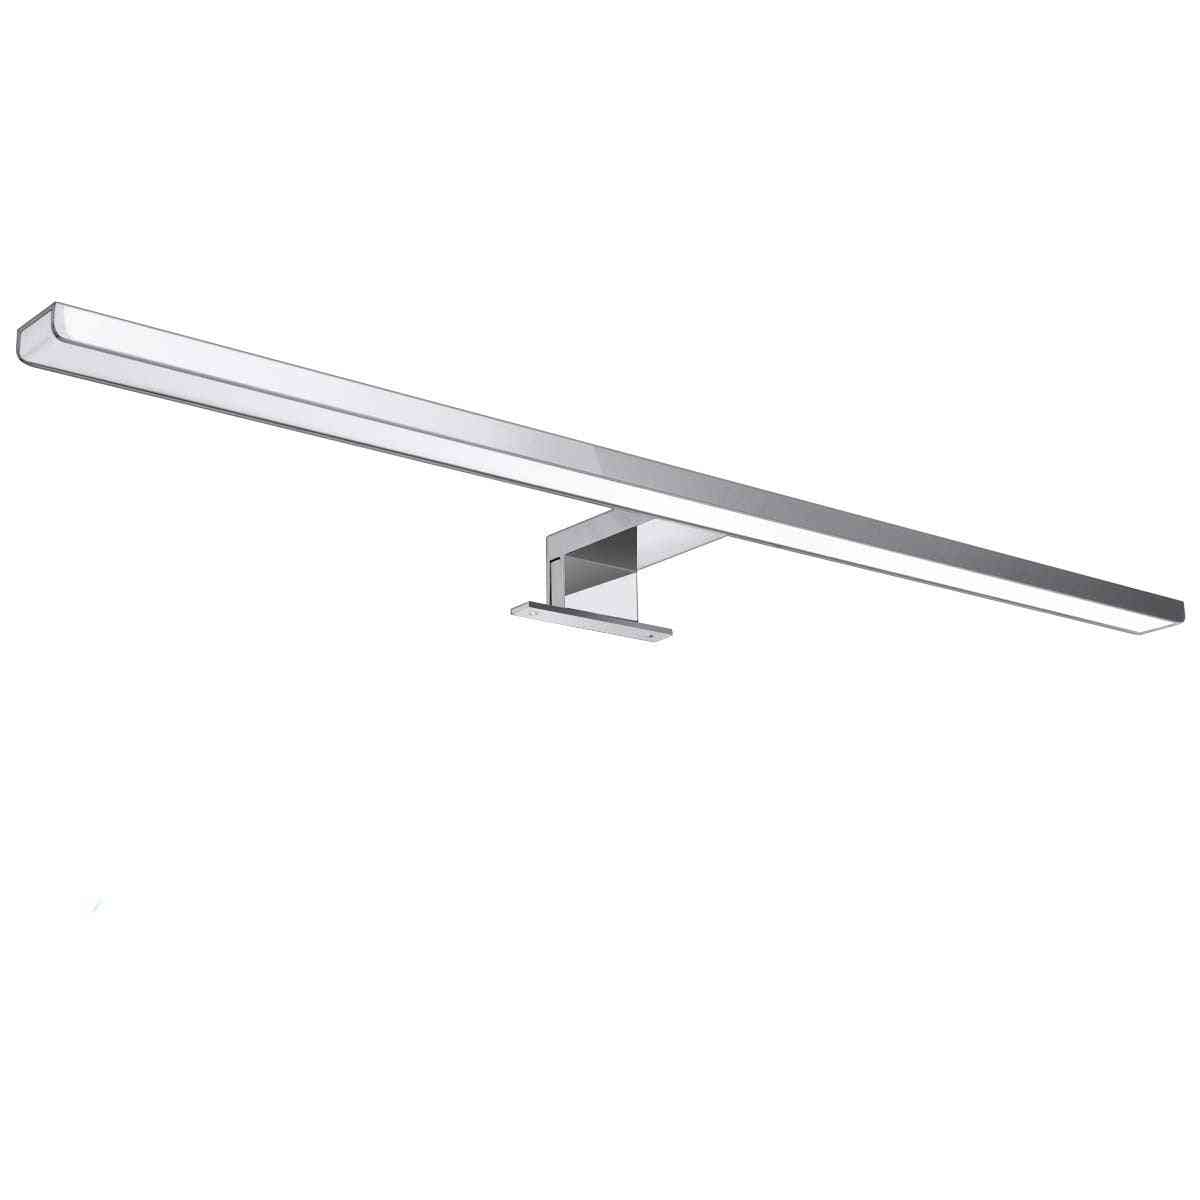 Led Wall Light Mirror Lamp-waterproof Aluminum Lighting For Bathroom, Restroom